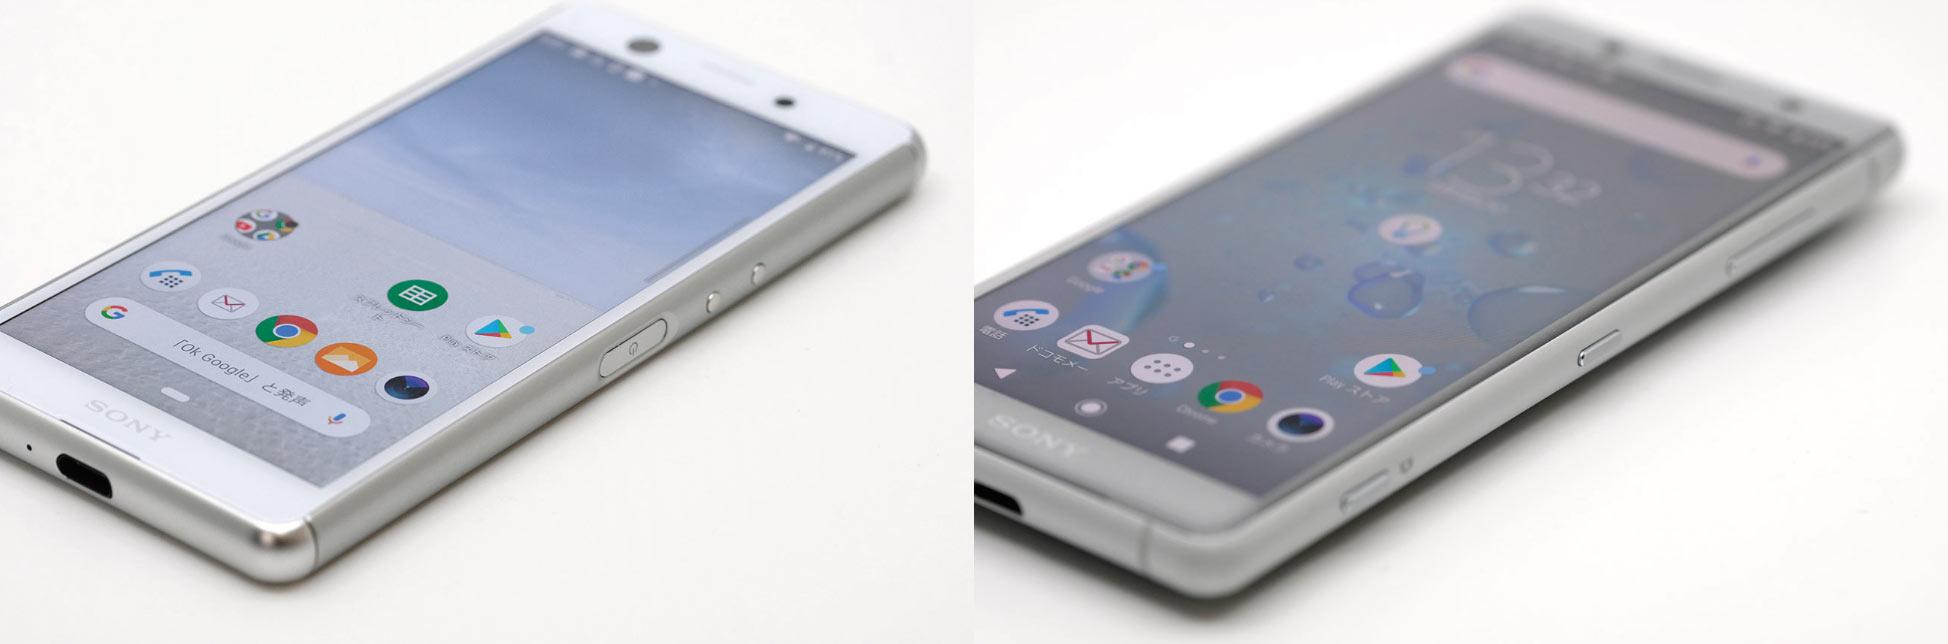 Xperia AceとXperia XZ2 Compact 正面デザインの違い